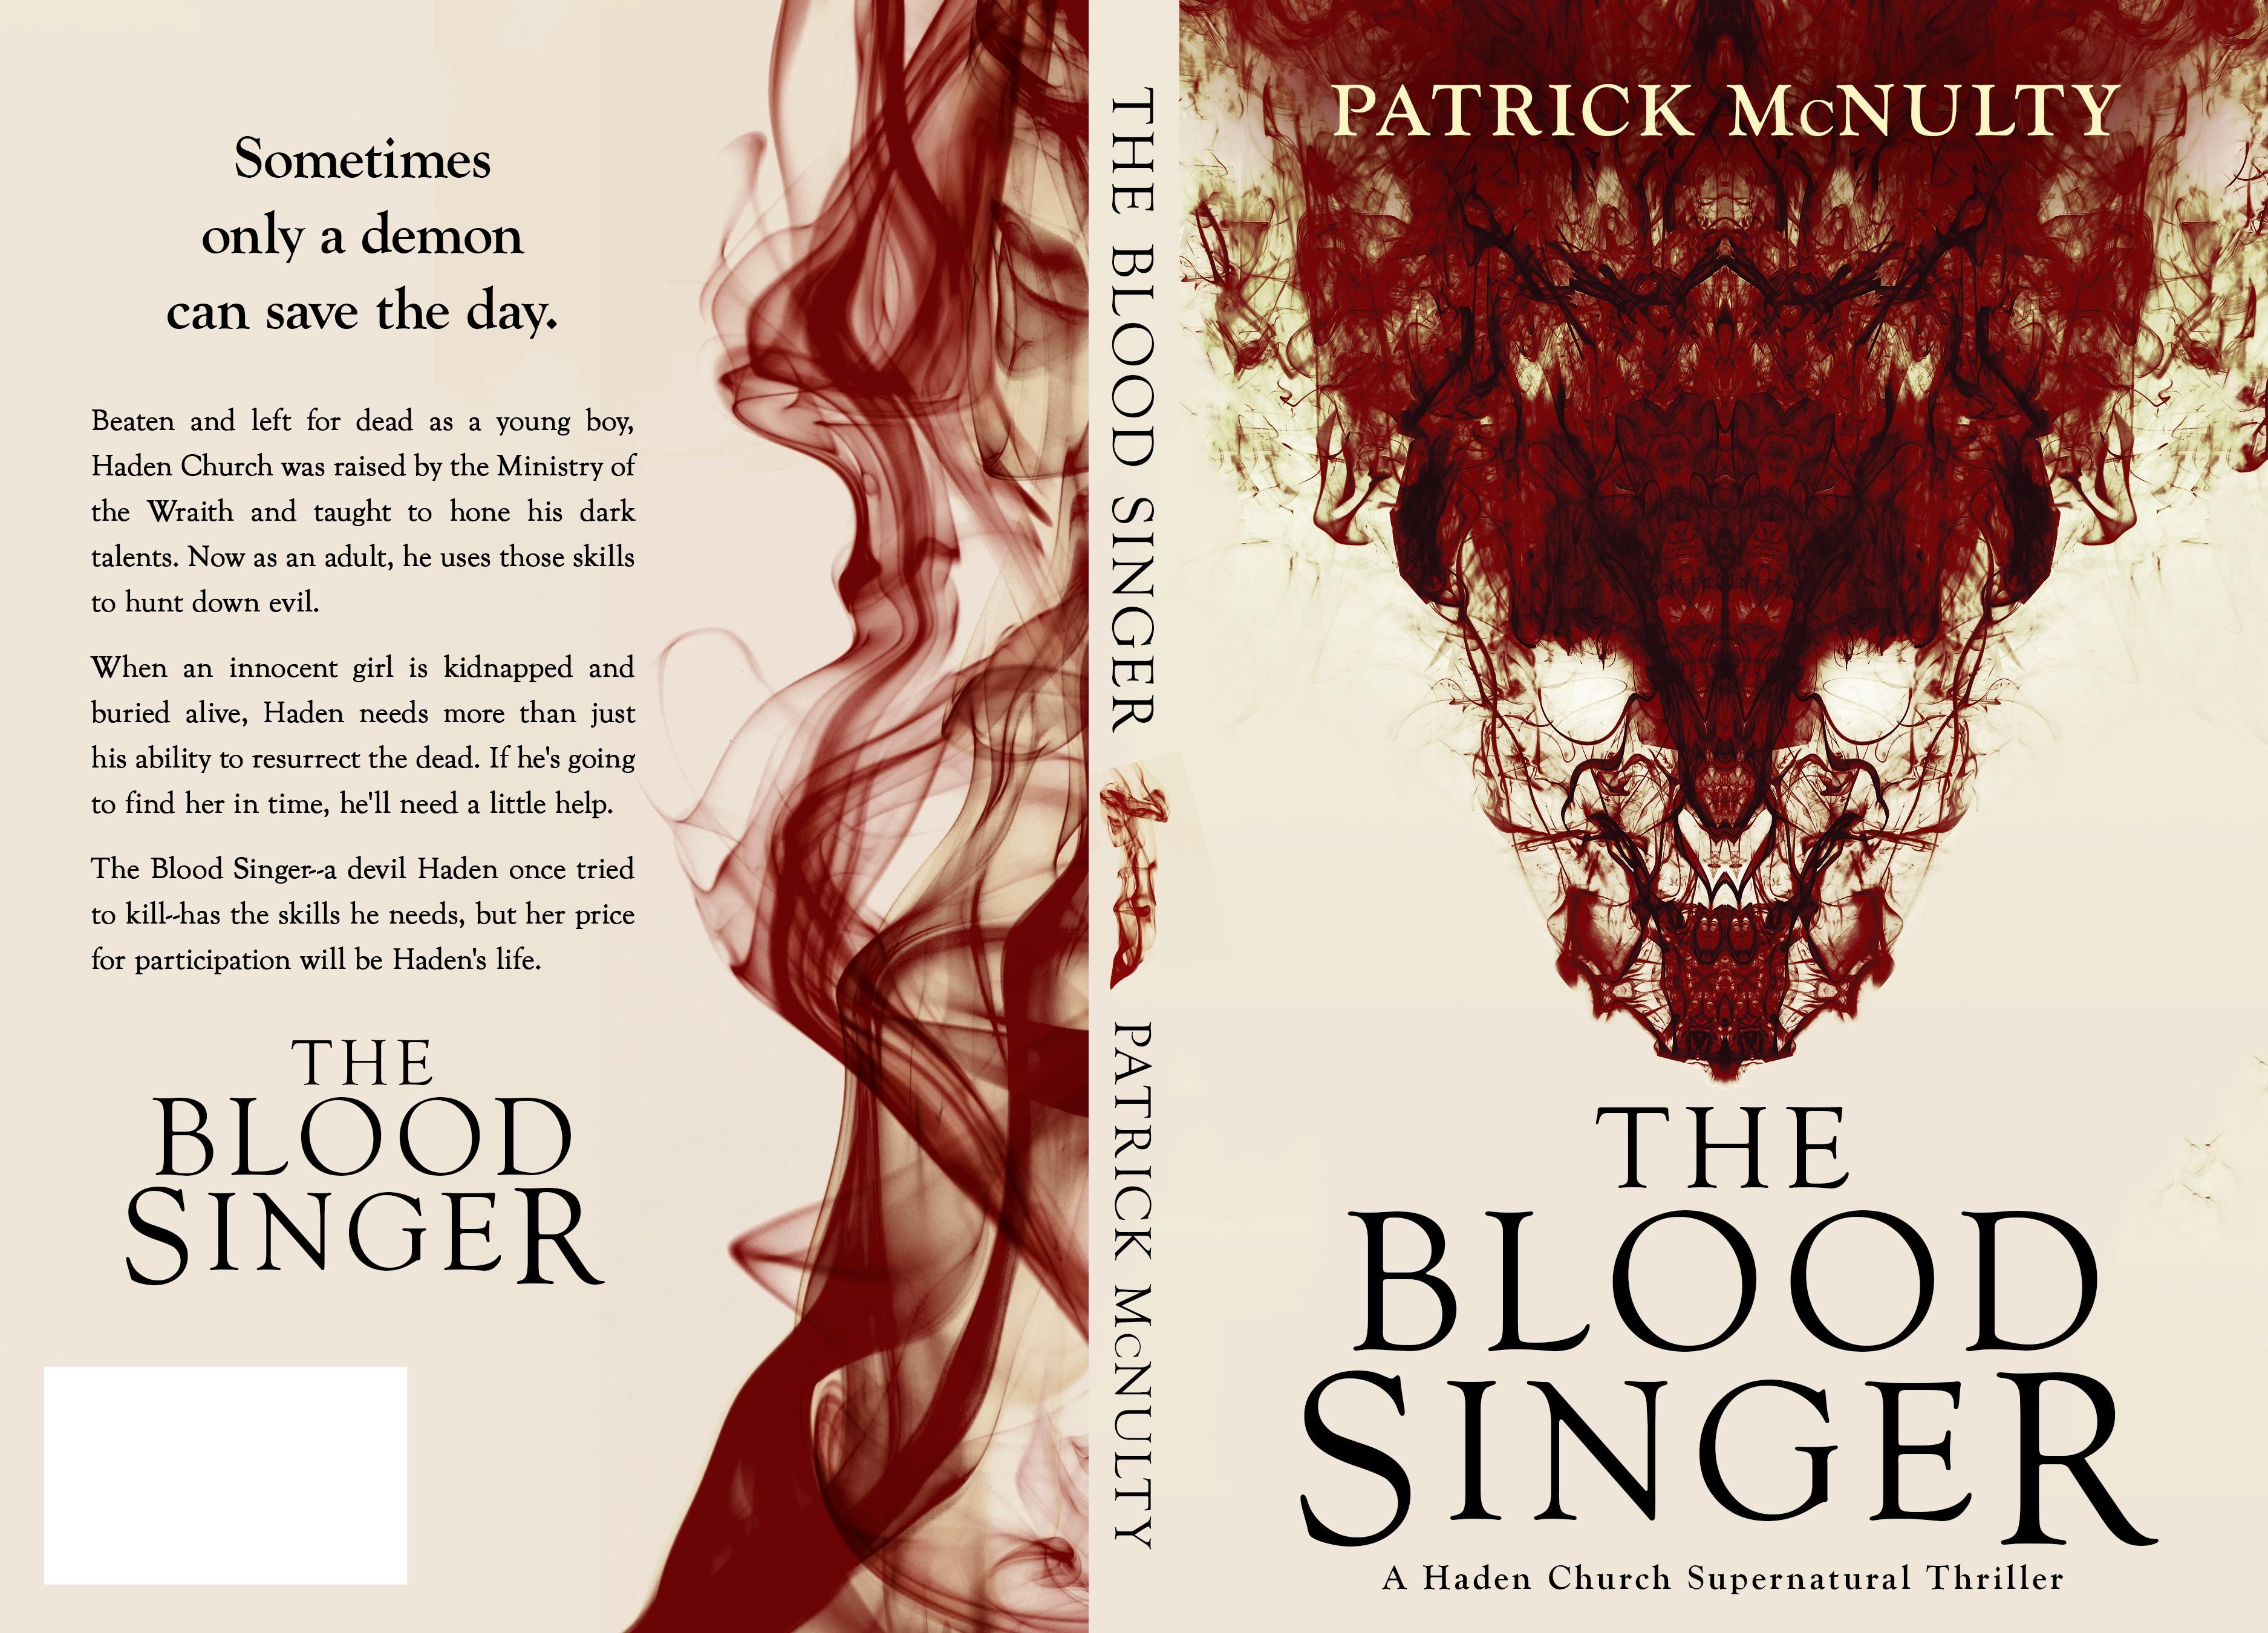 Dark supernatural thriller needs an amazing book cover!